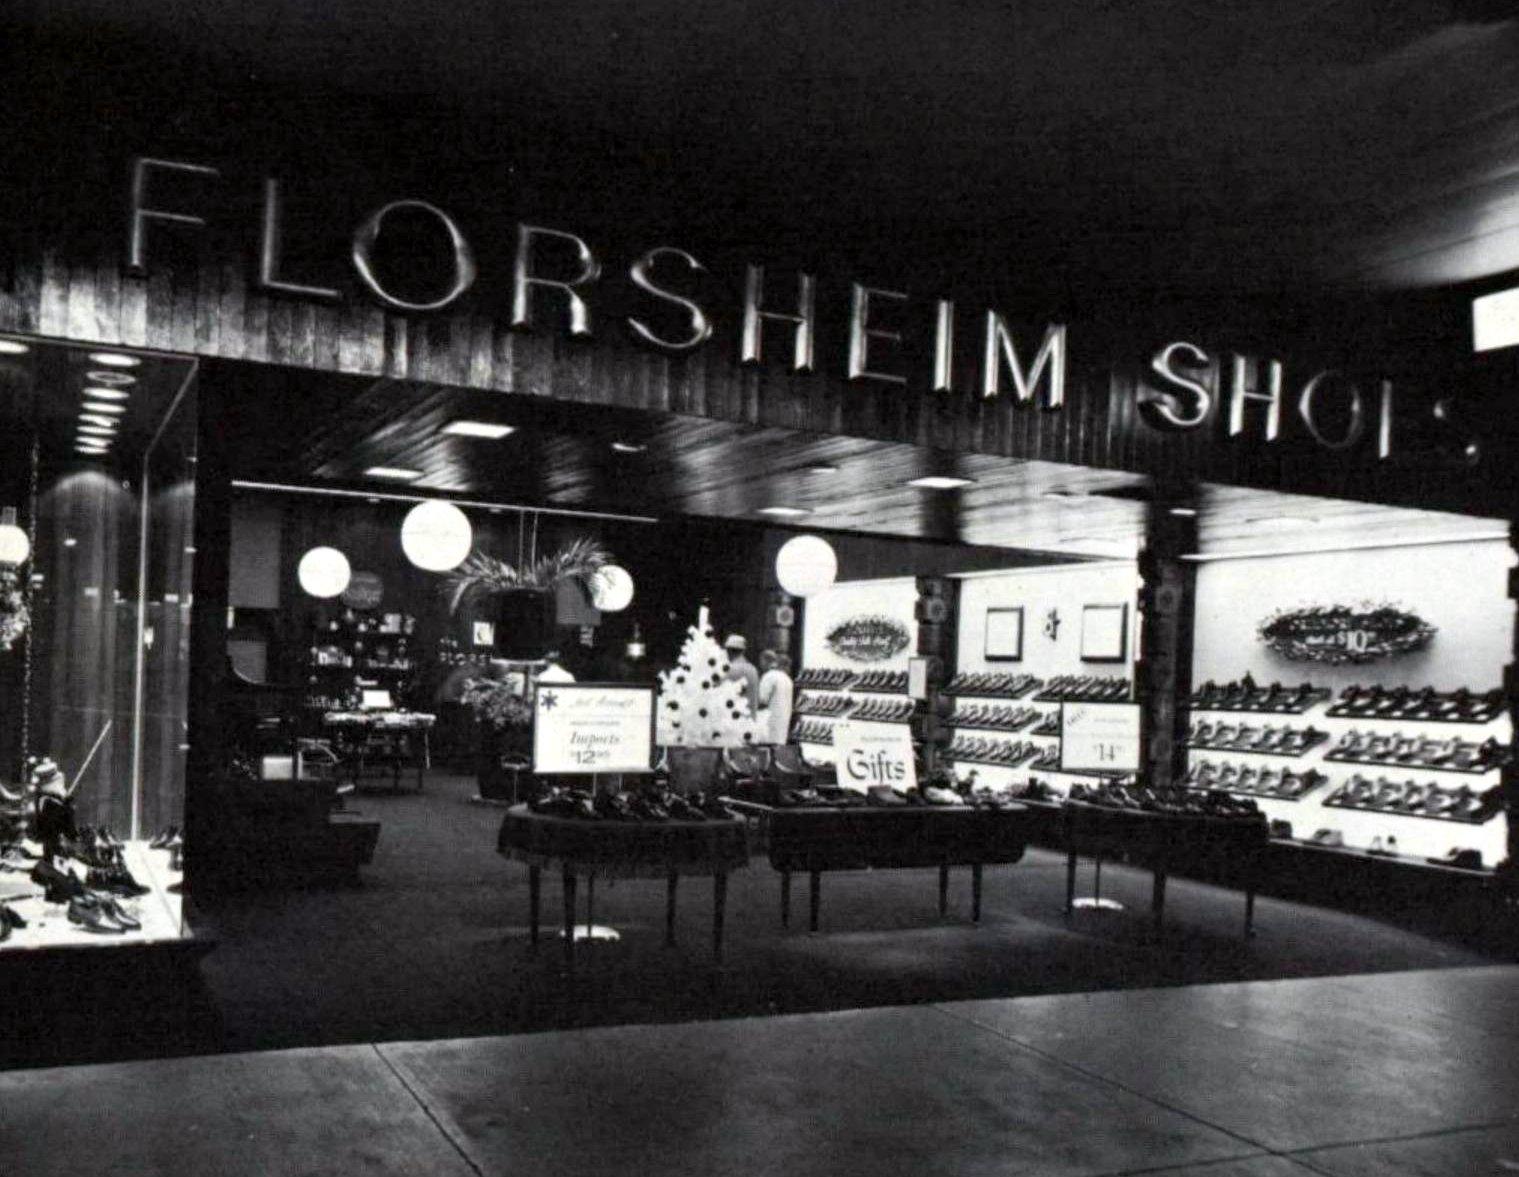 Retro mall shoe store - Florsheim (1963)